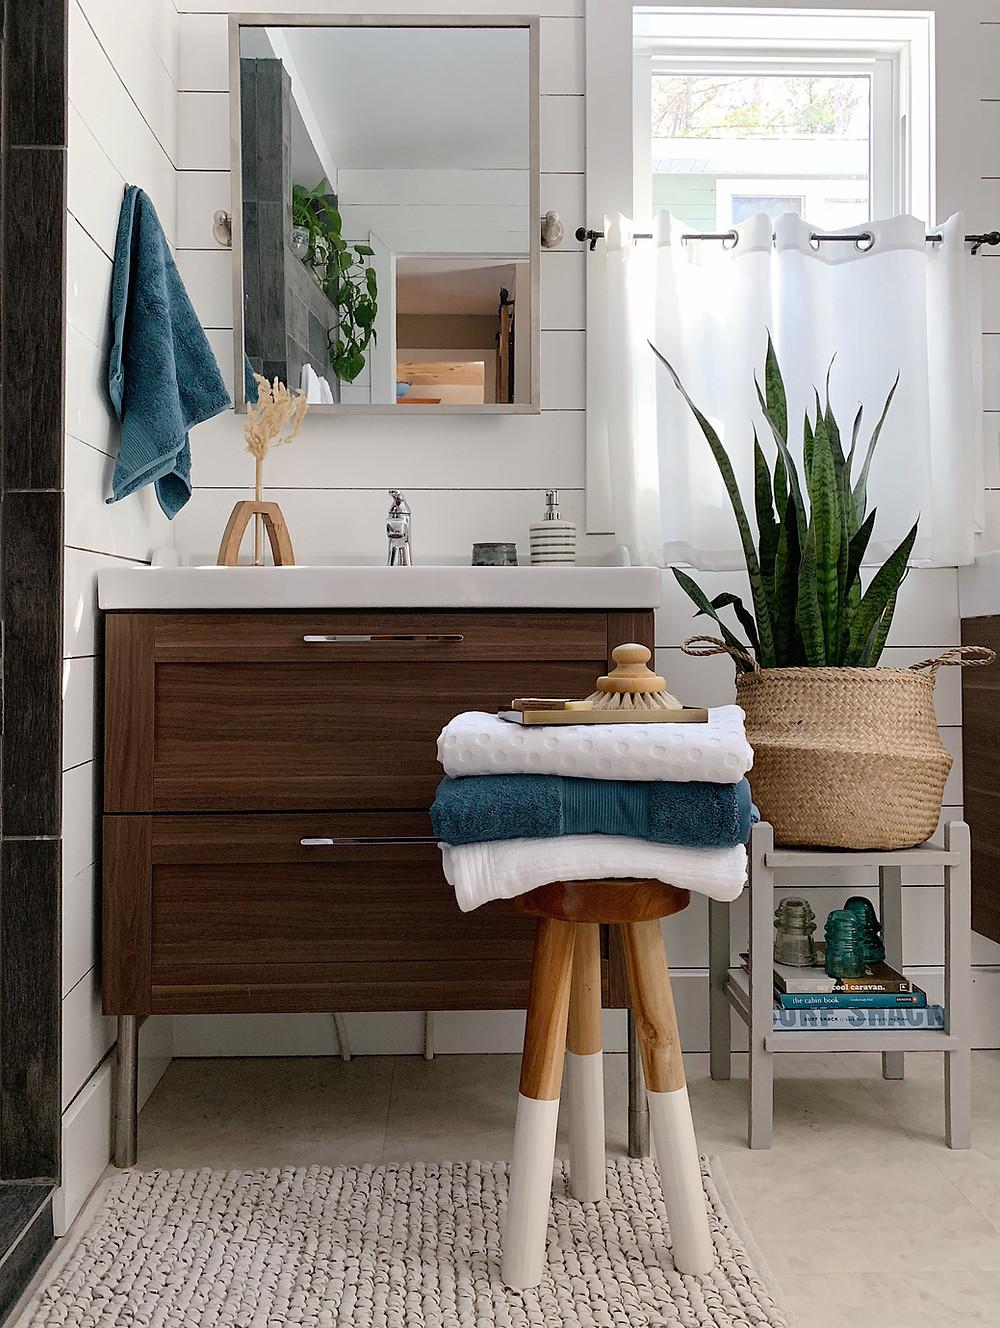 shiplap bathroom with ikea sinks